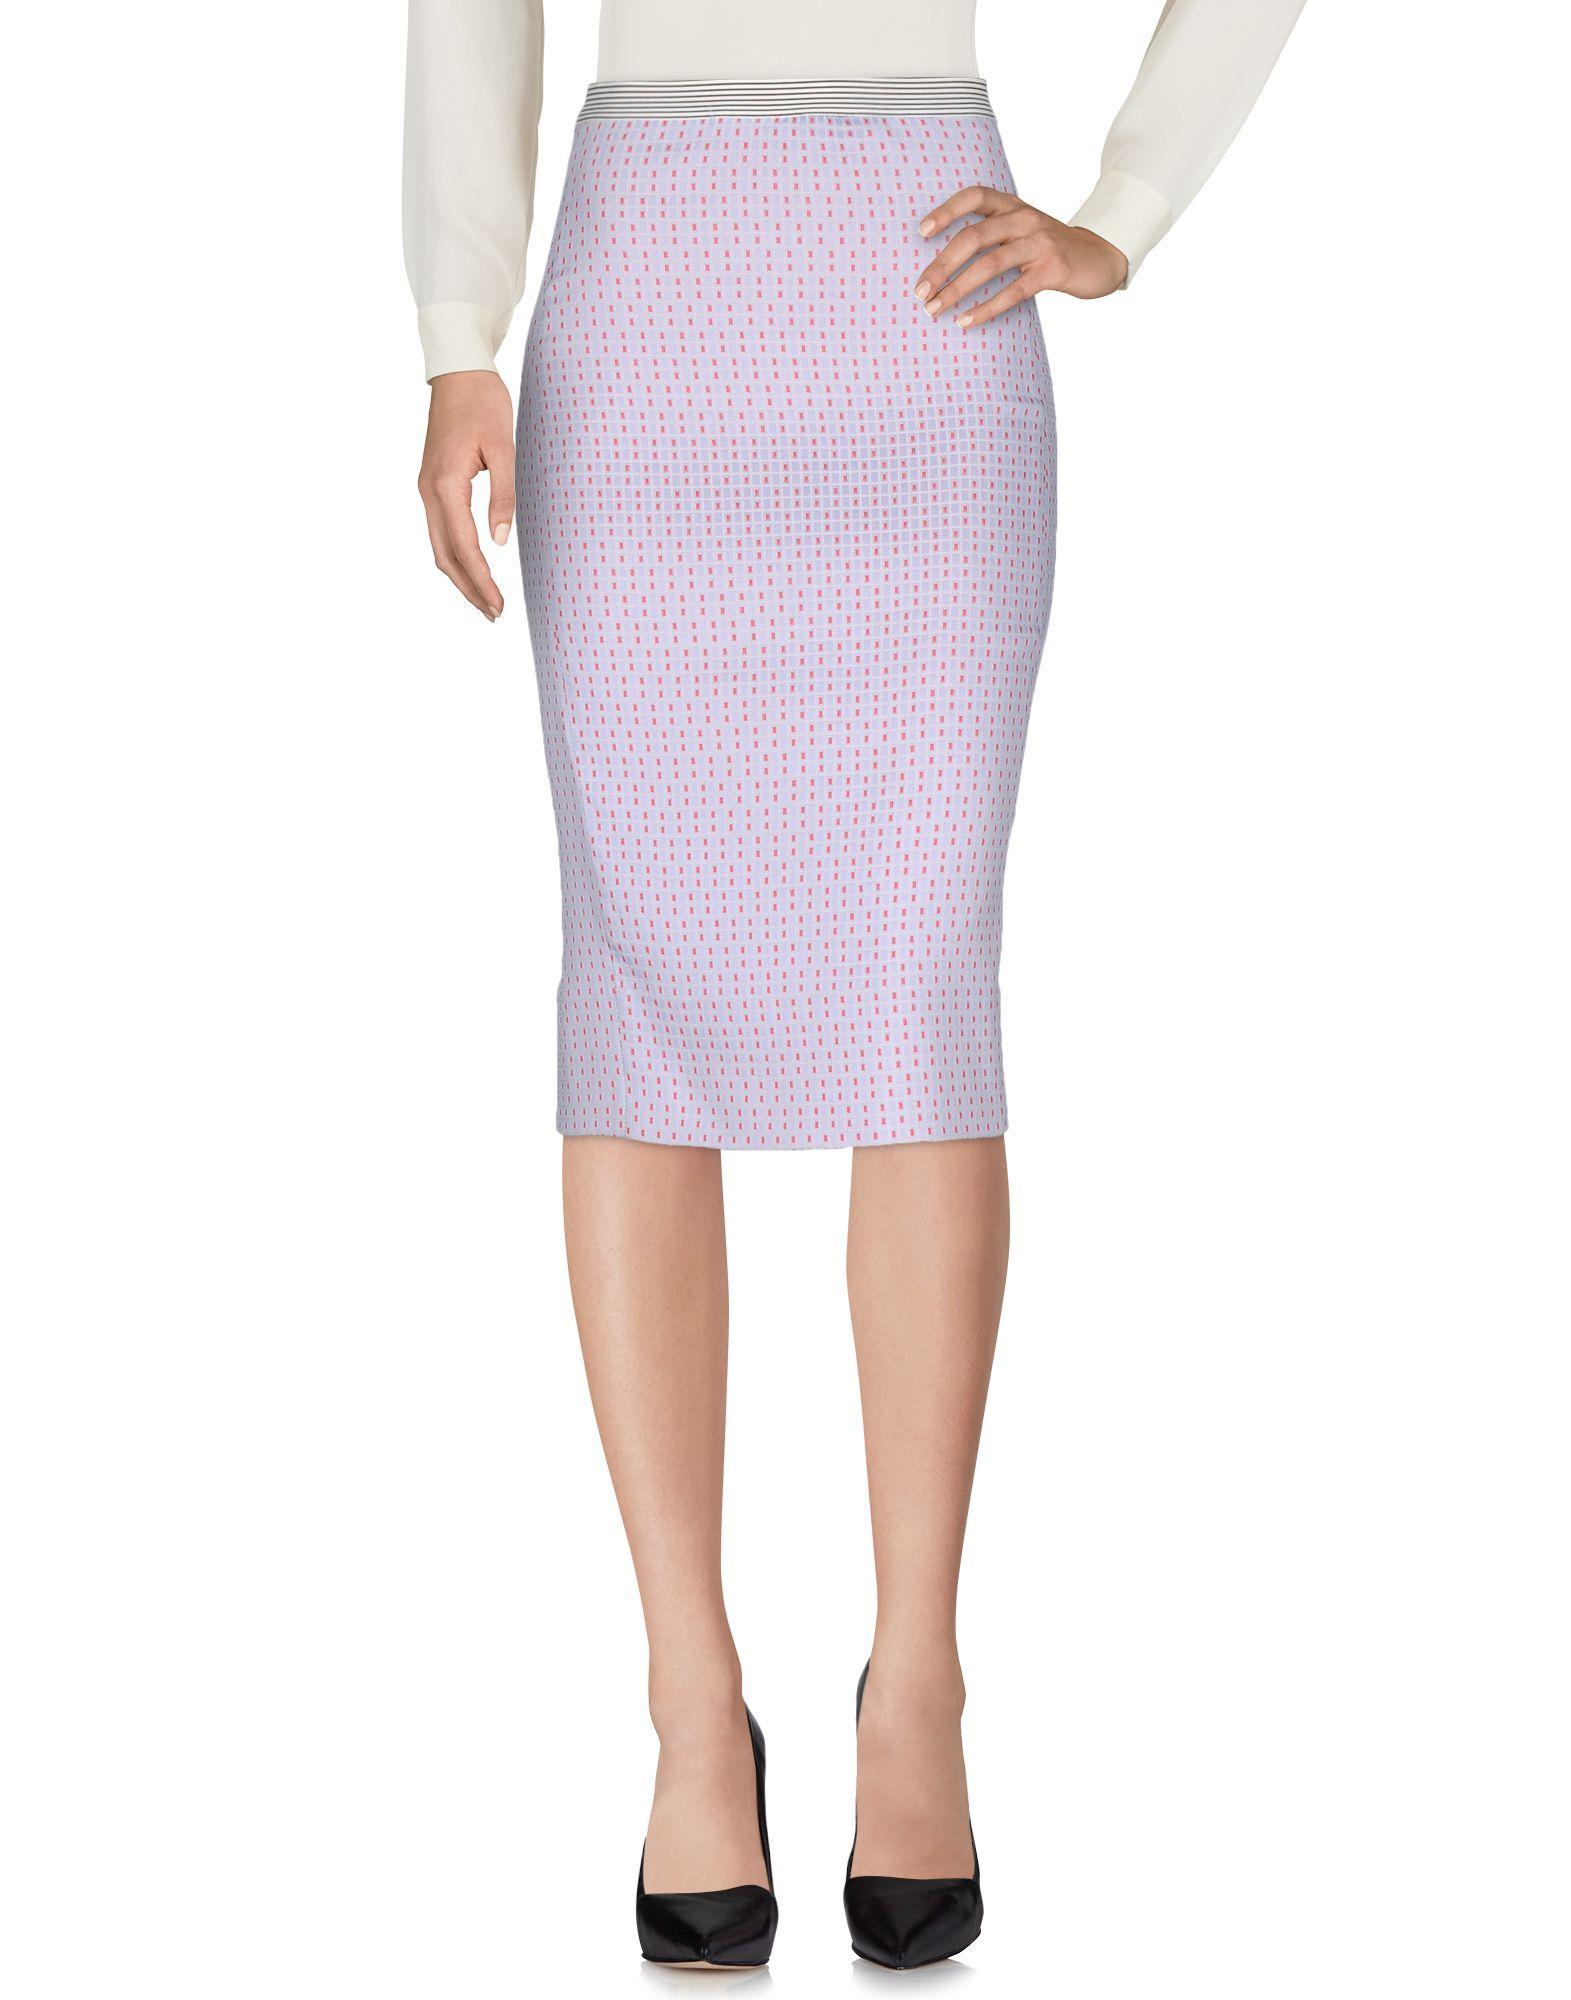 Teresa Dainelli Midi Skirts In Sky Blue